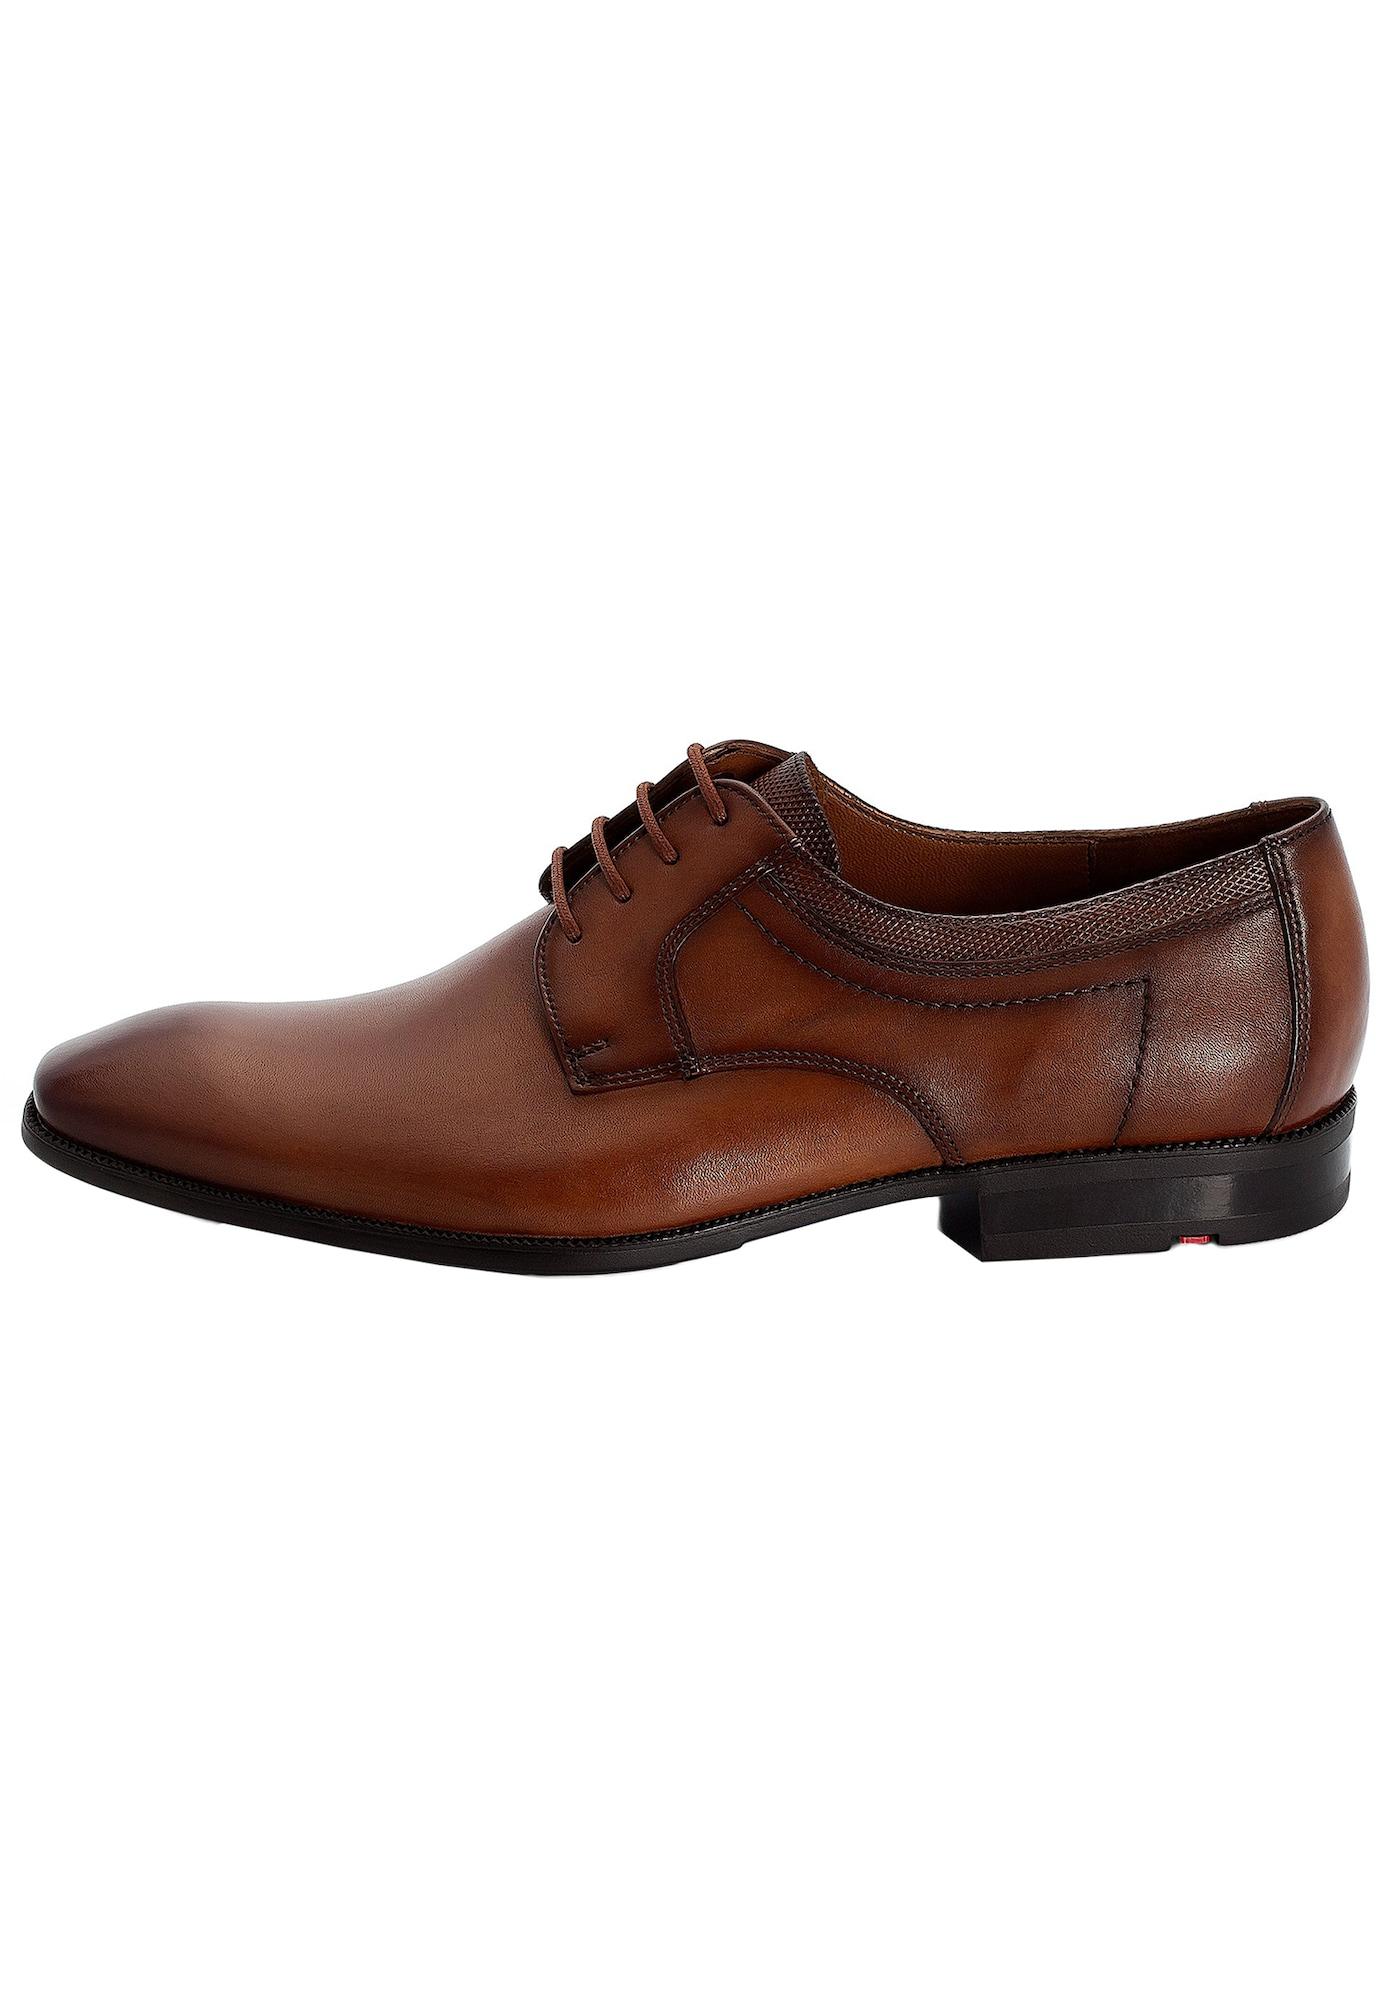 lloyd - Schuhe 'LACOUR'